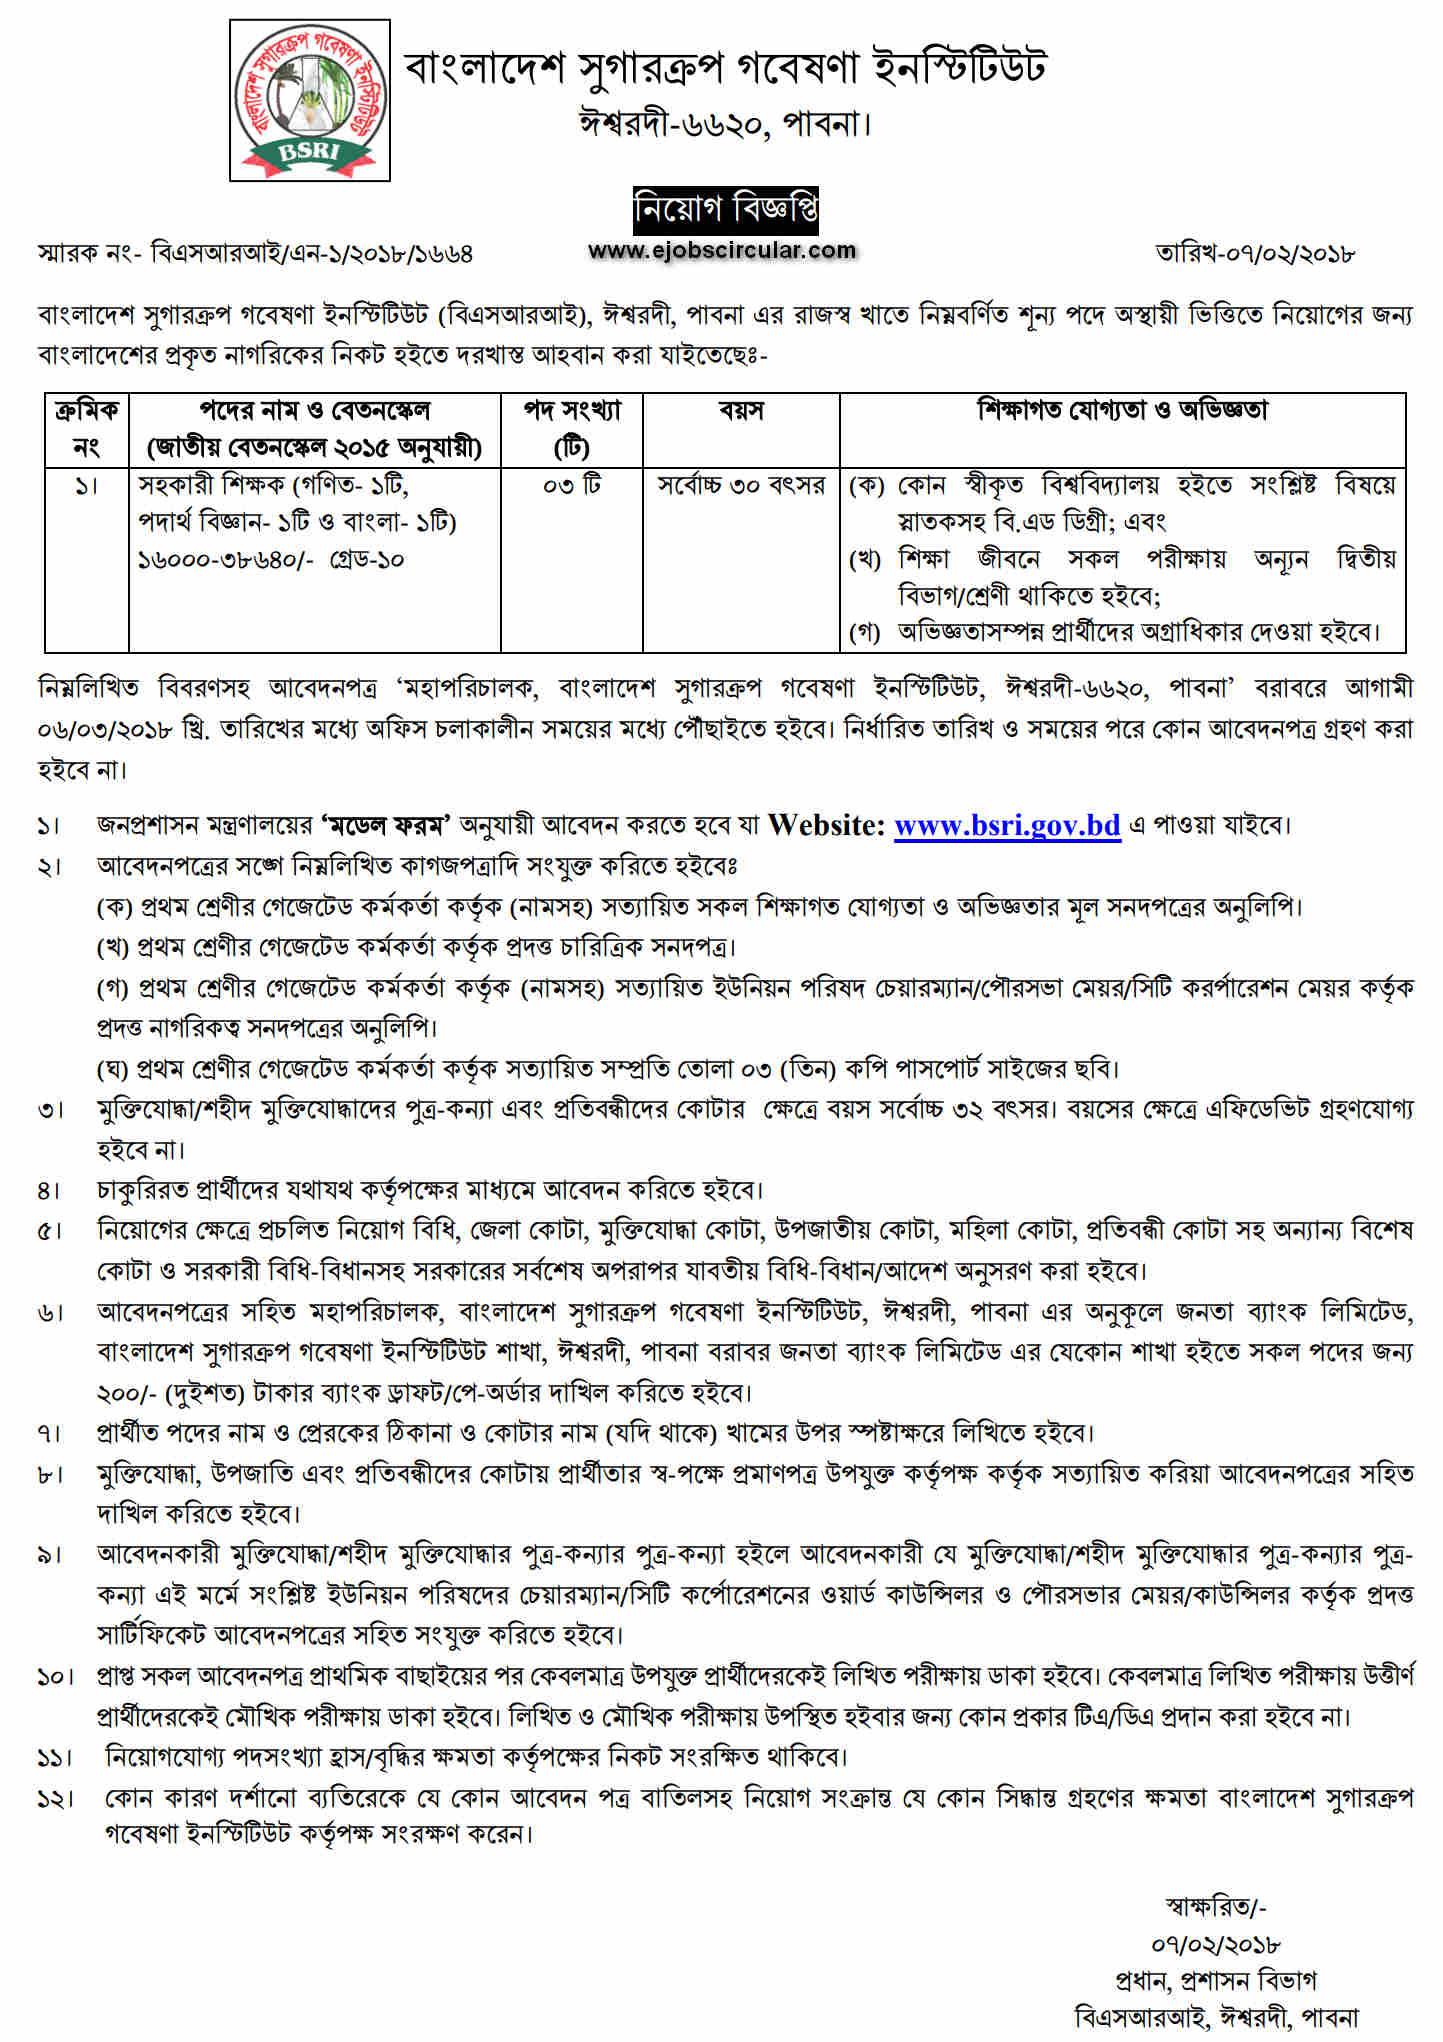 BSRI Job Circular